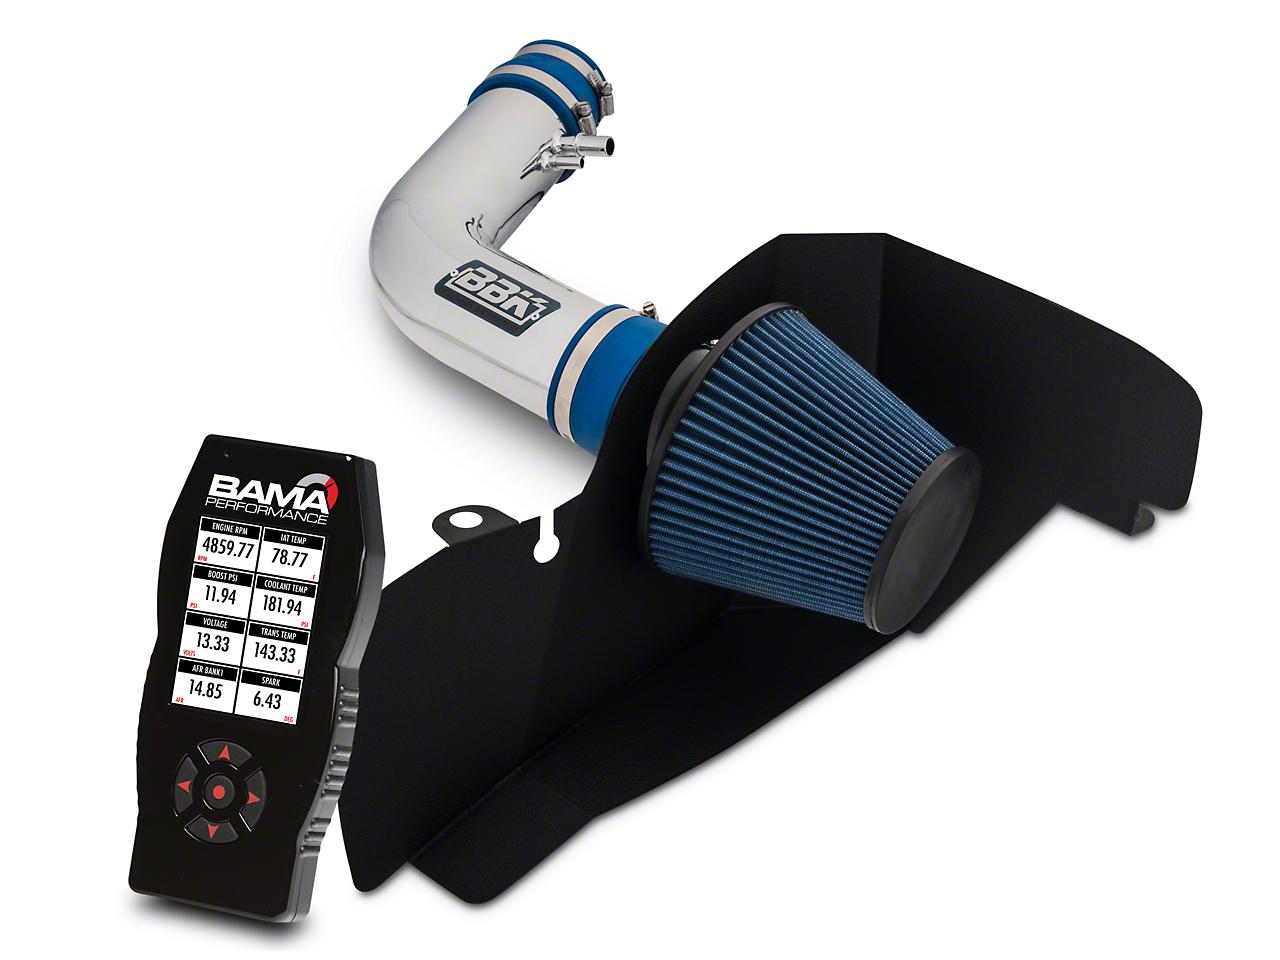 BBK Chrome Cold Air Intake & Bama X4 Tuner (15-17 V6)